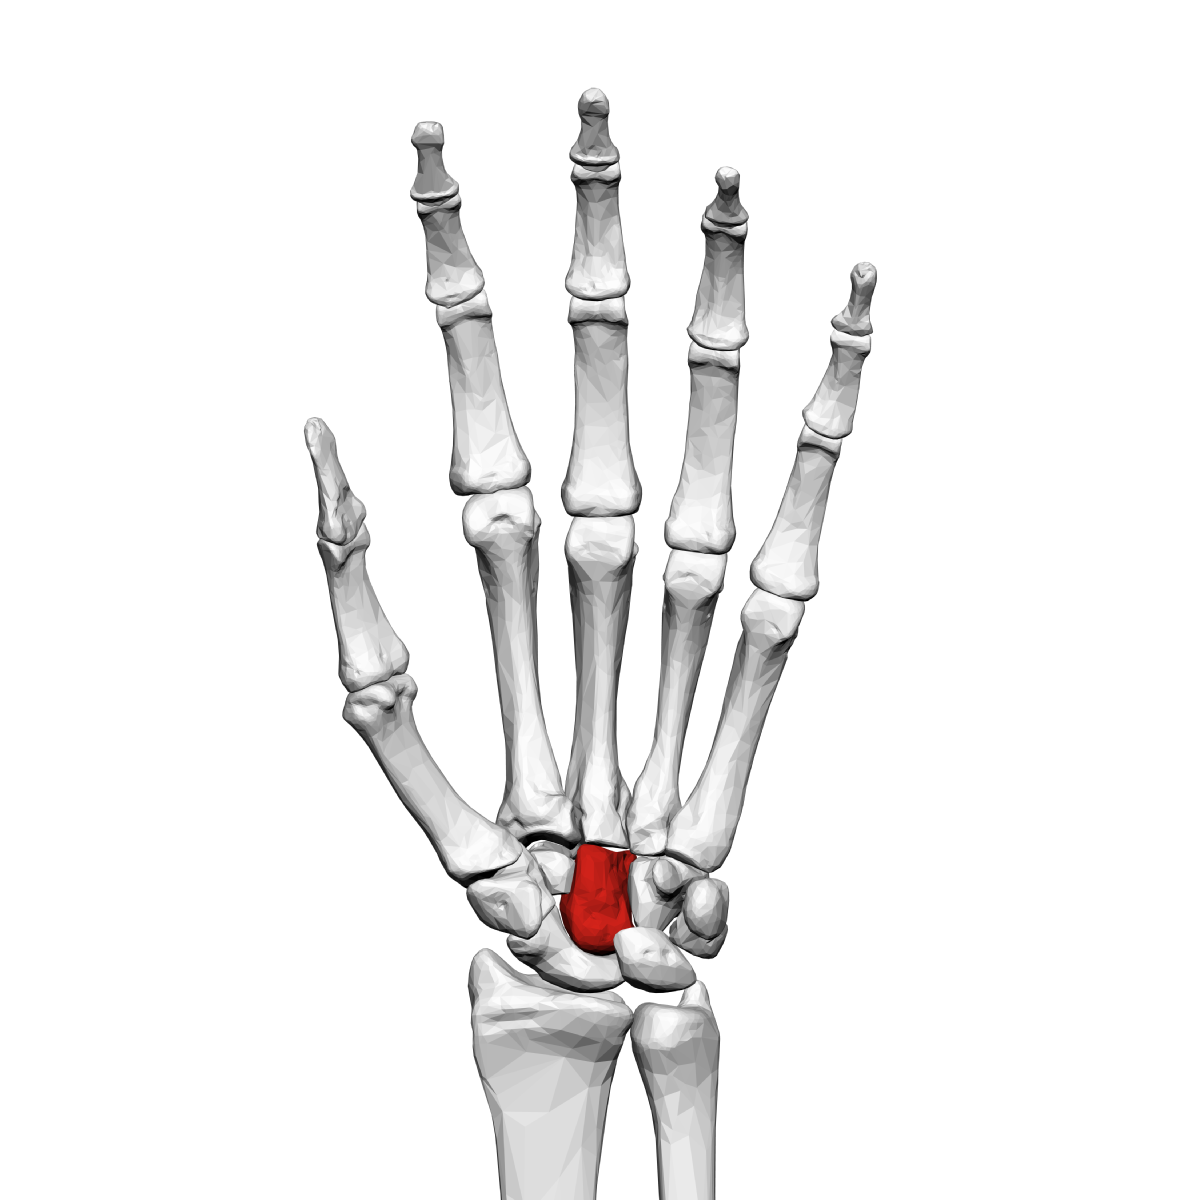 Capitate Bone Wikipedia